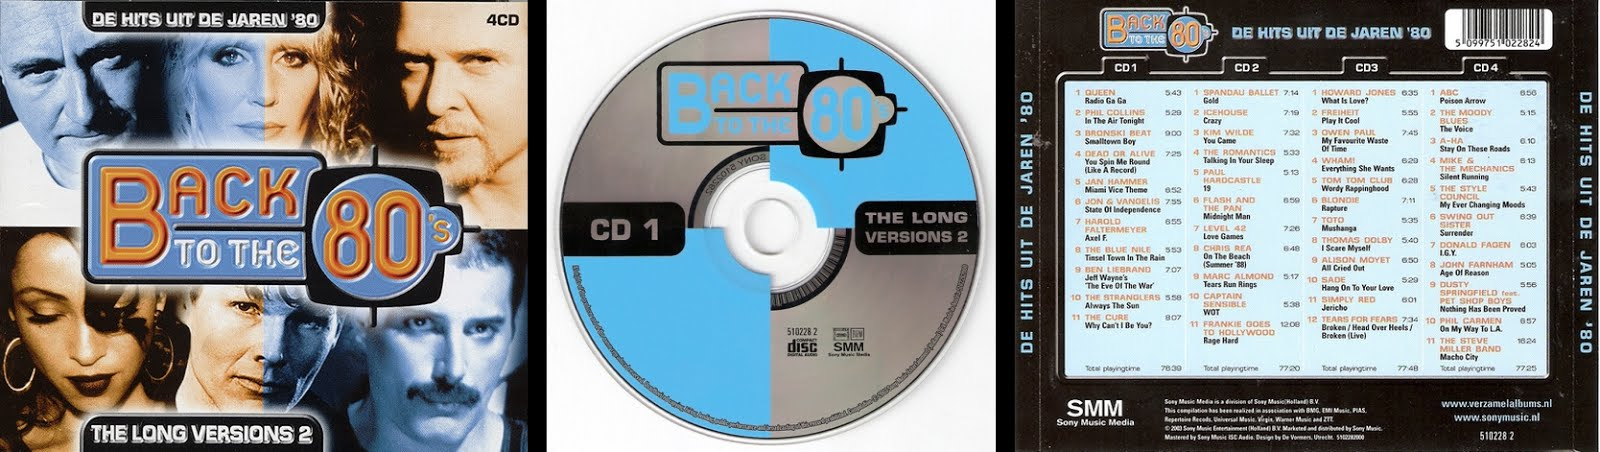 torrent cds